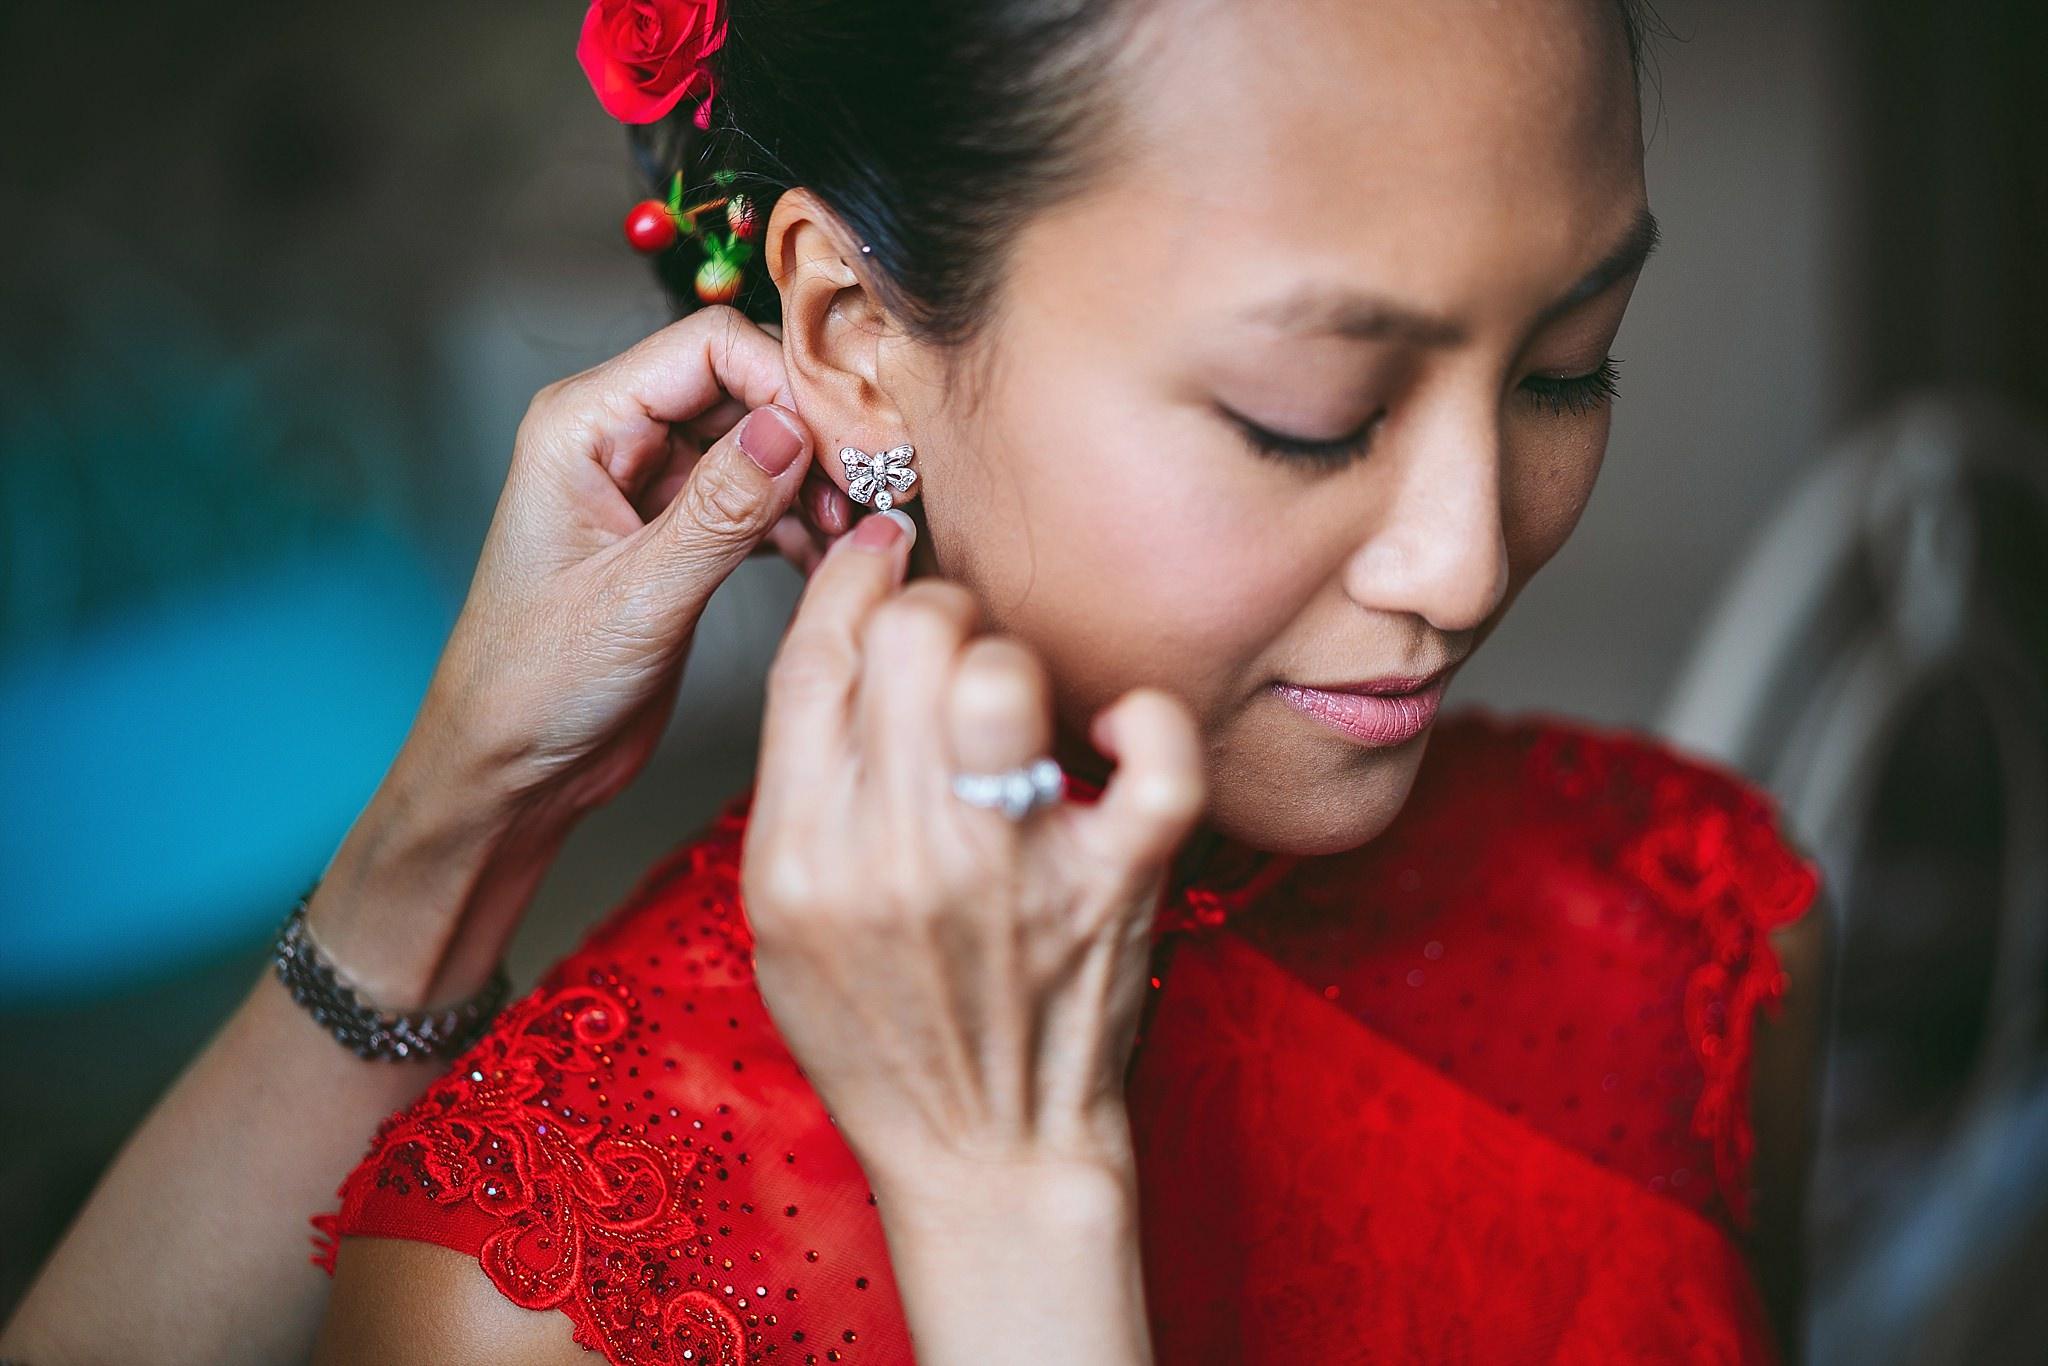 aga-tomaszek-wedding-photographer-cardiff-2016_1016